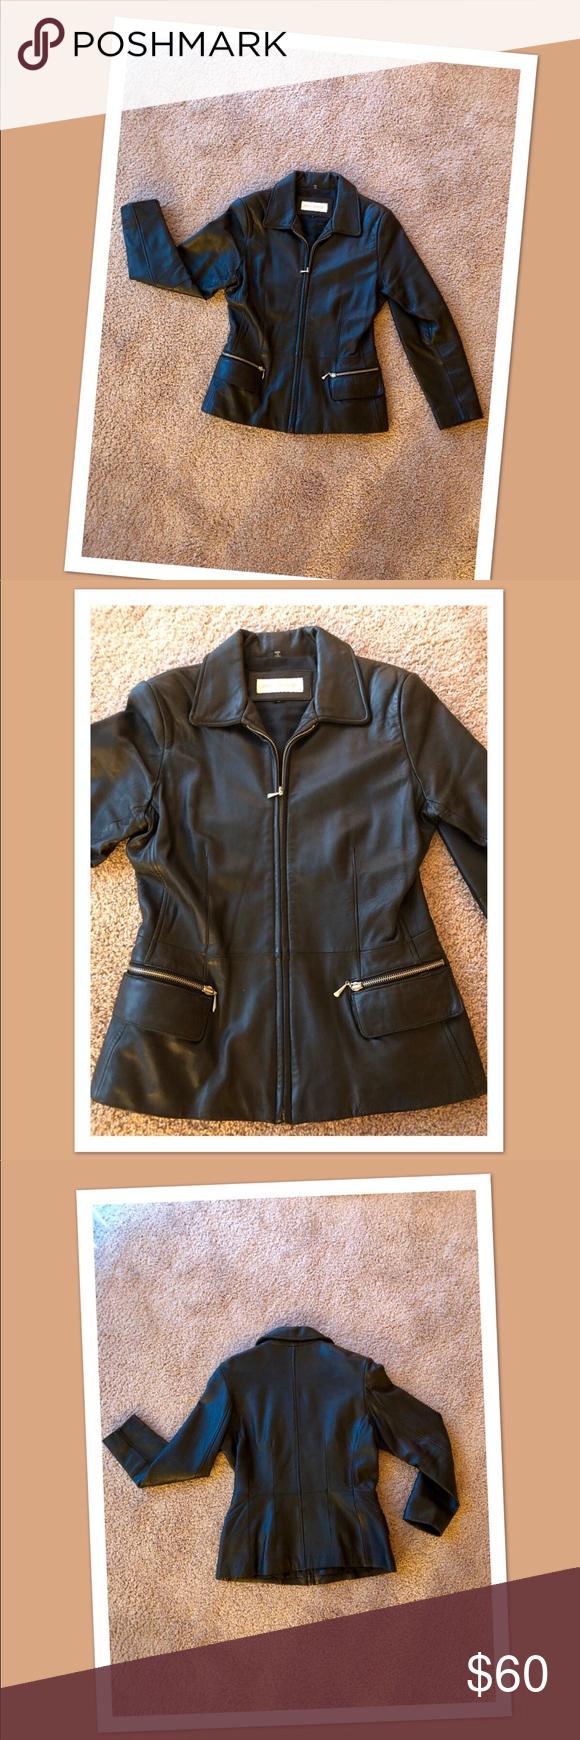 Jones New York Leather Jacket Leather Jacket Jones New York Leather [ 1740 x 580 Pixel ]